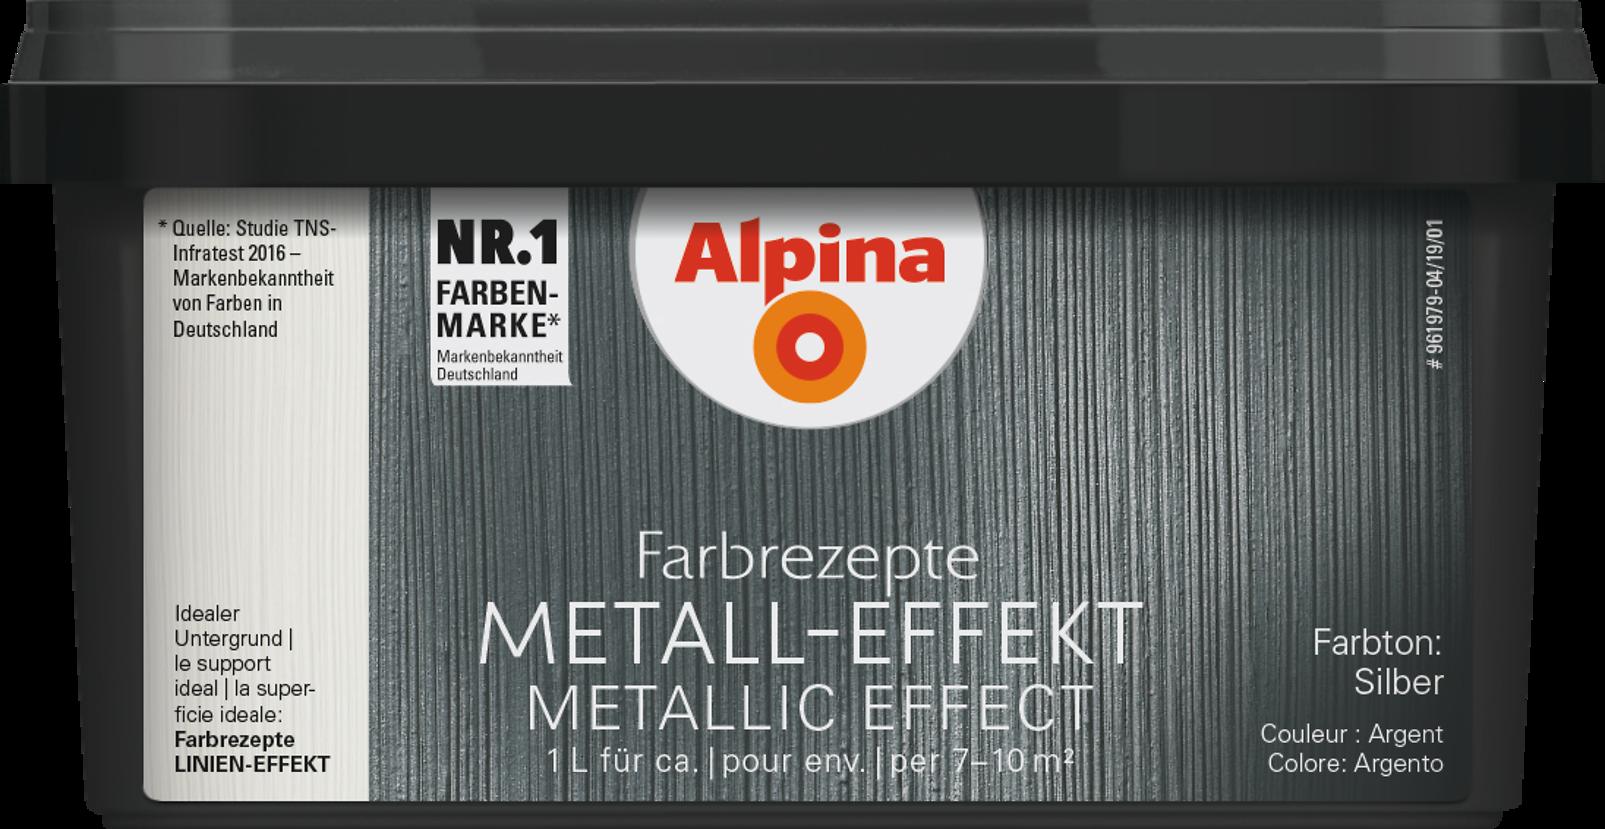 metallic wandfarbe  effektfarbe silber  alpina farbrezepte metall-effekt silber